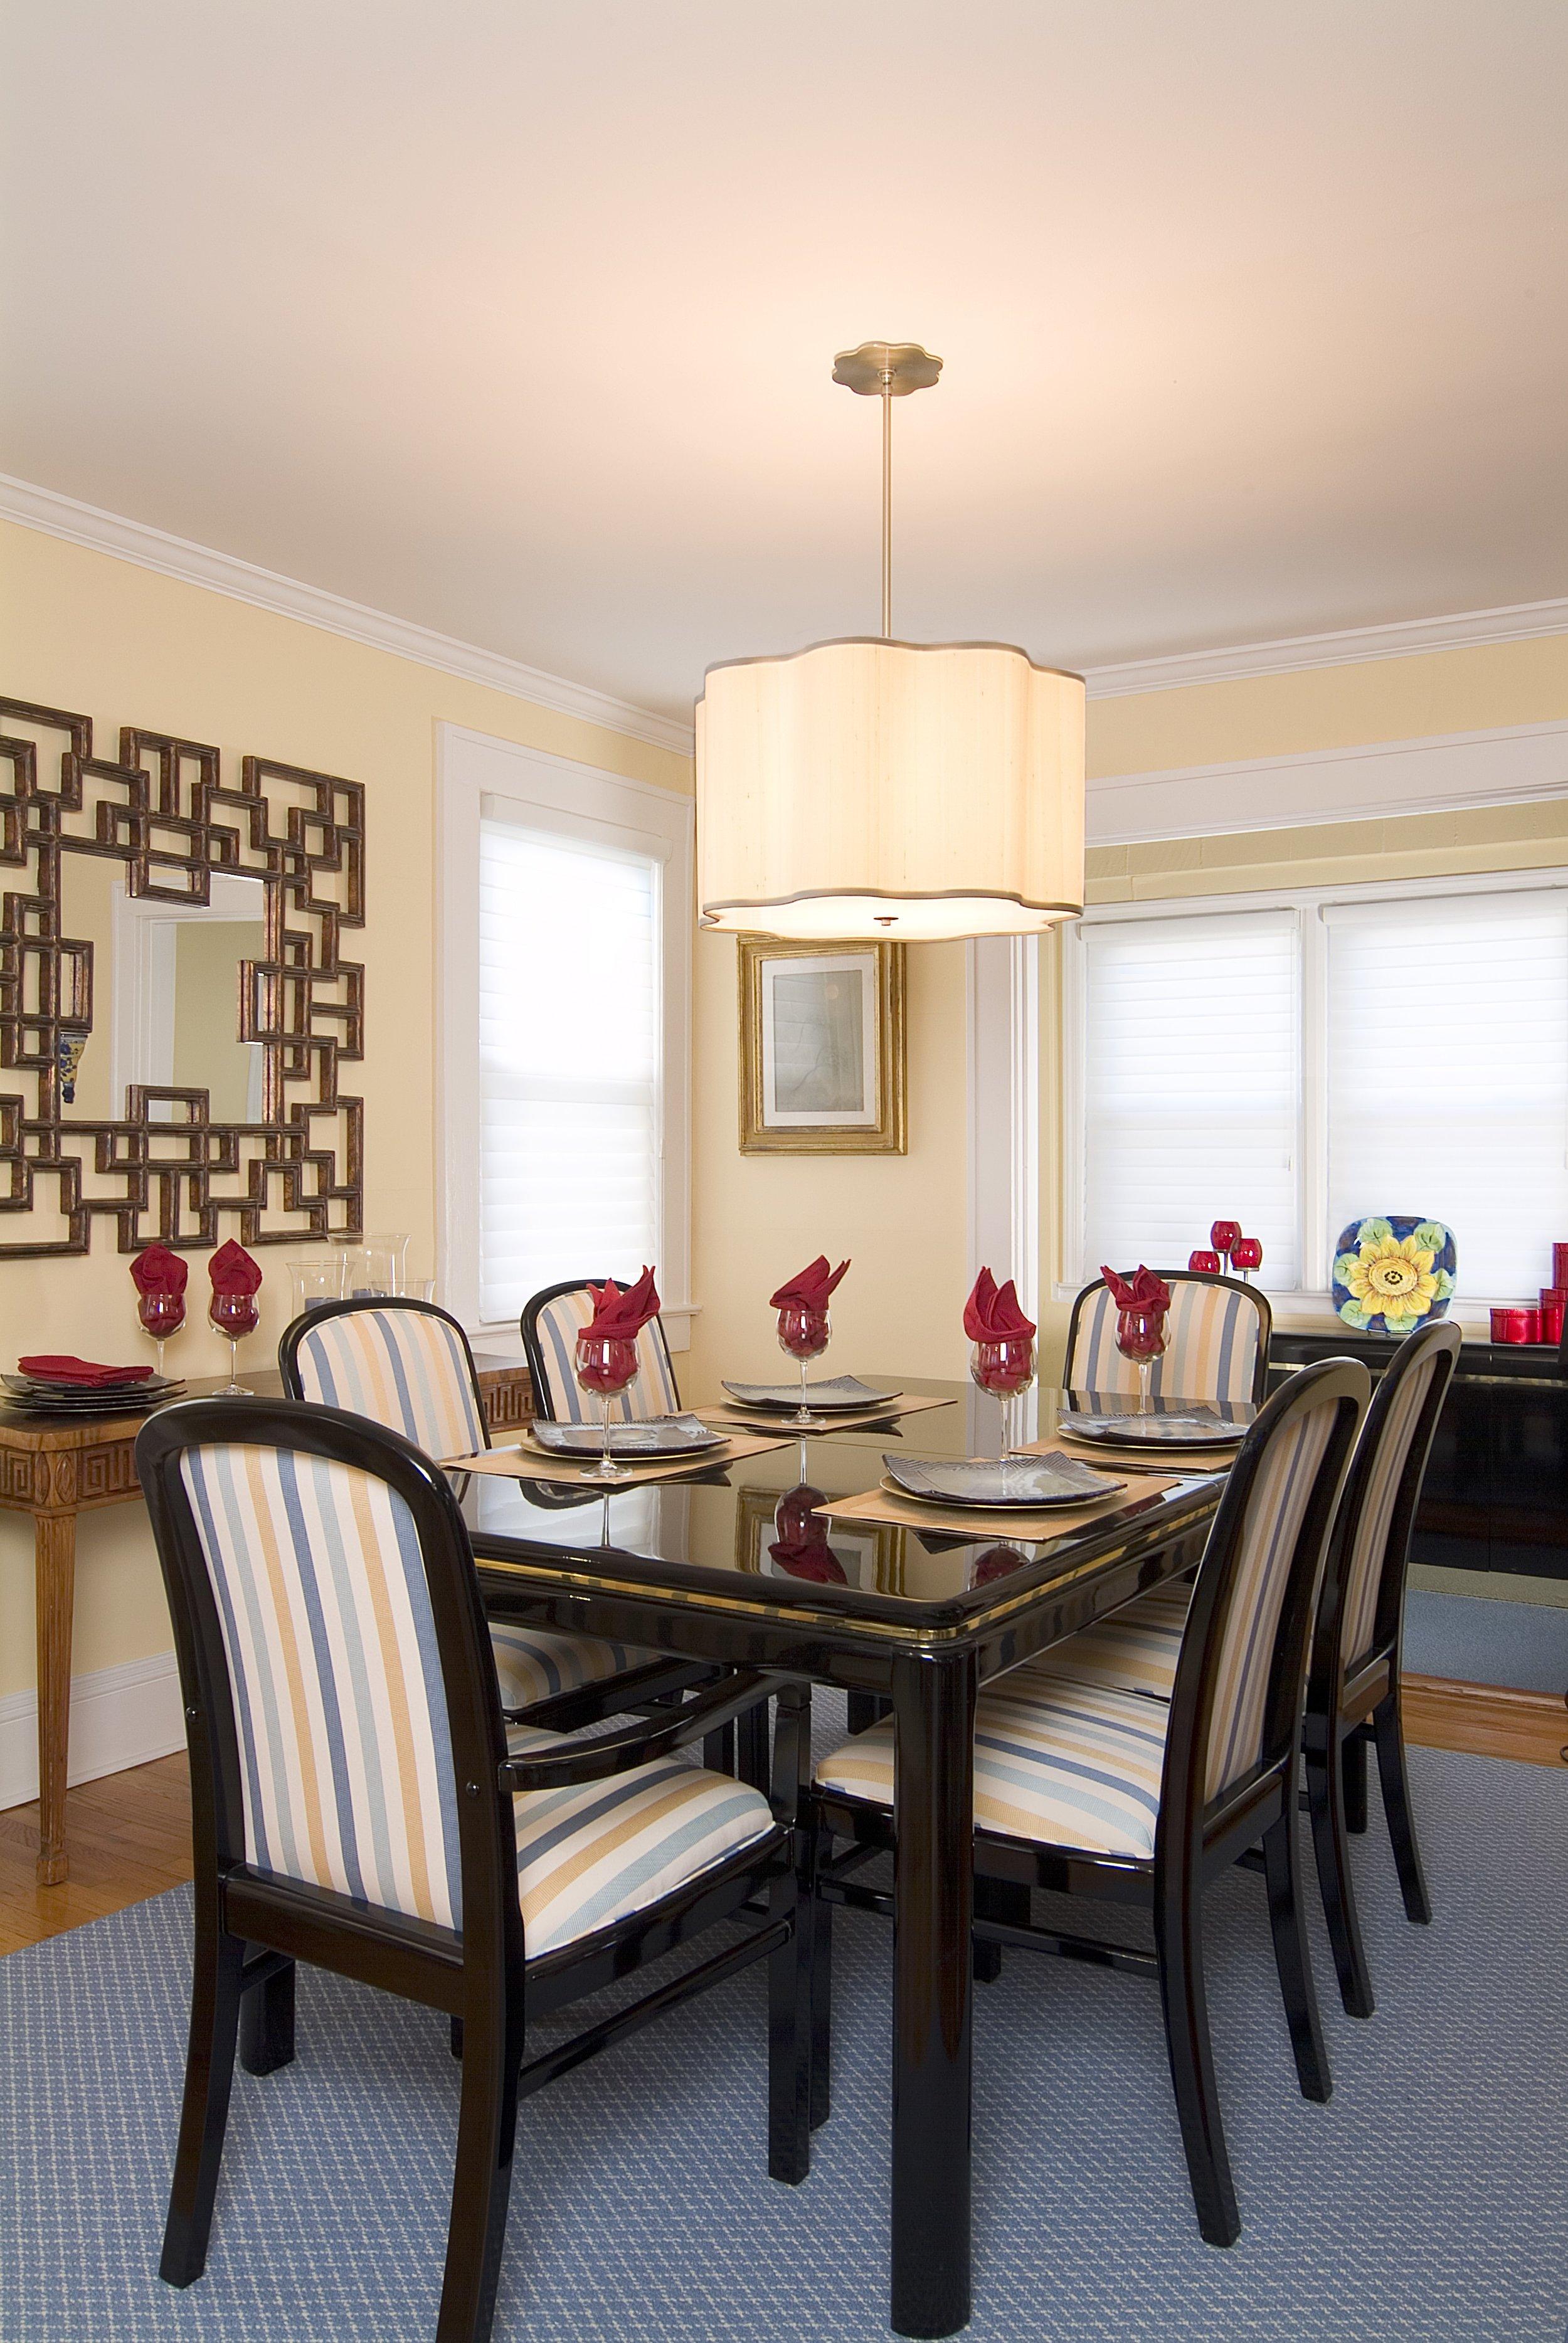 Bailiwick Interior Design - Dining Room Repurpose Drum Shade Chandelier.jpg